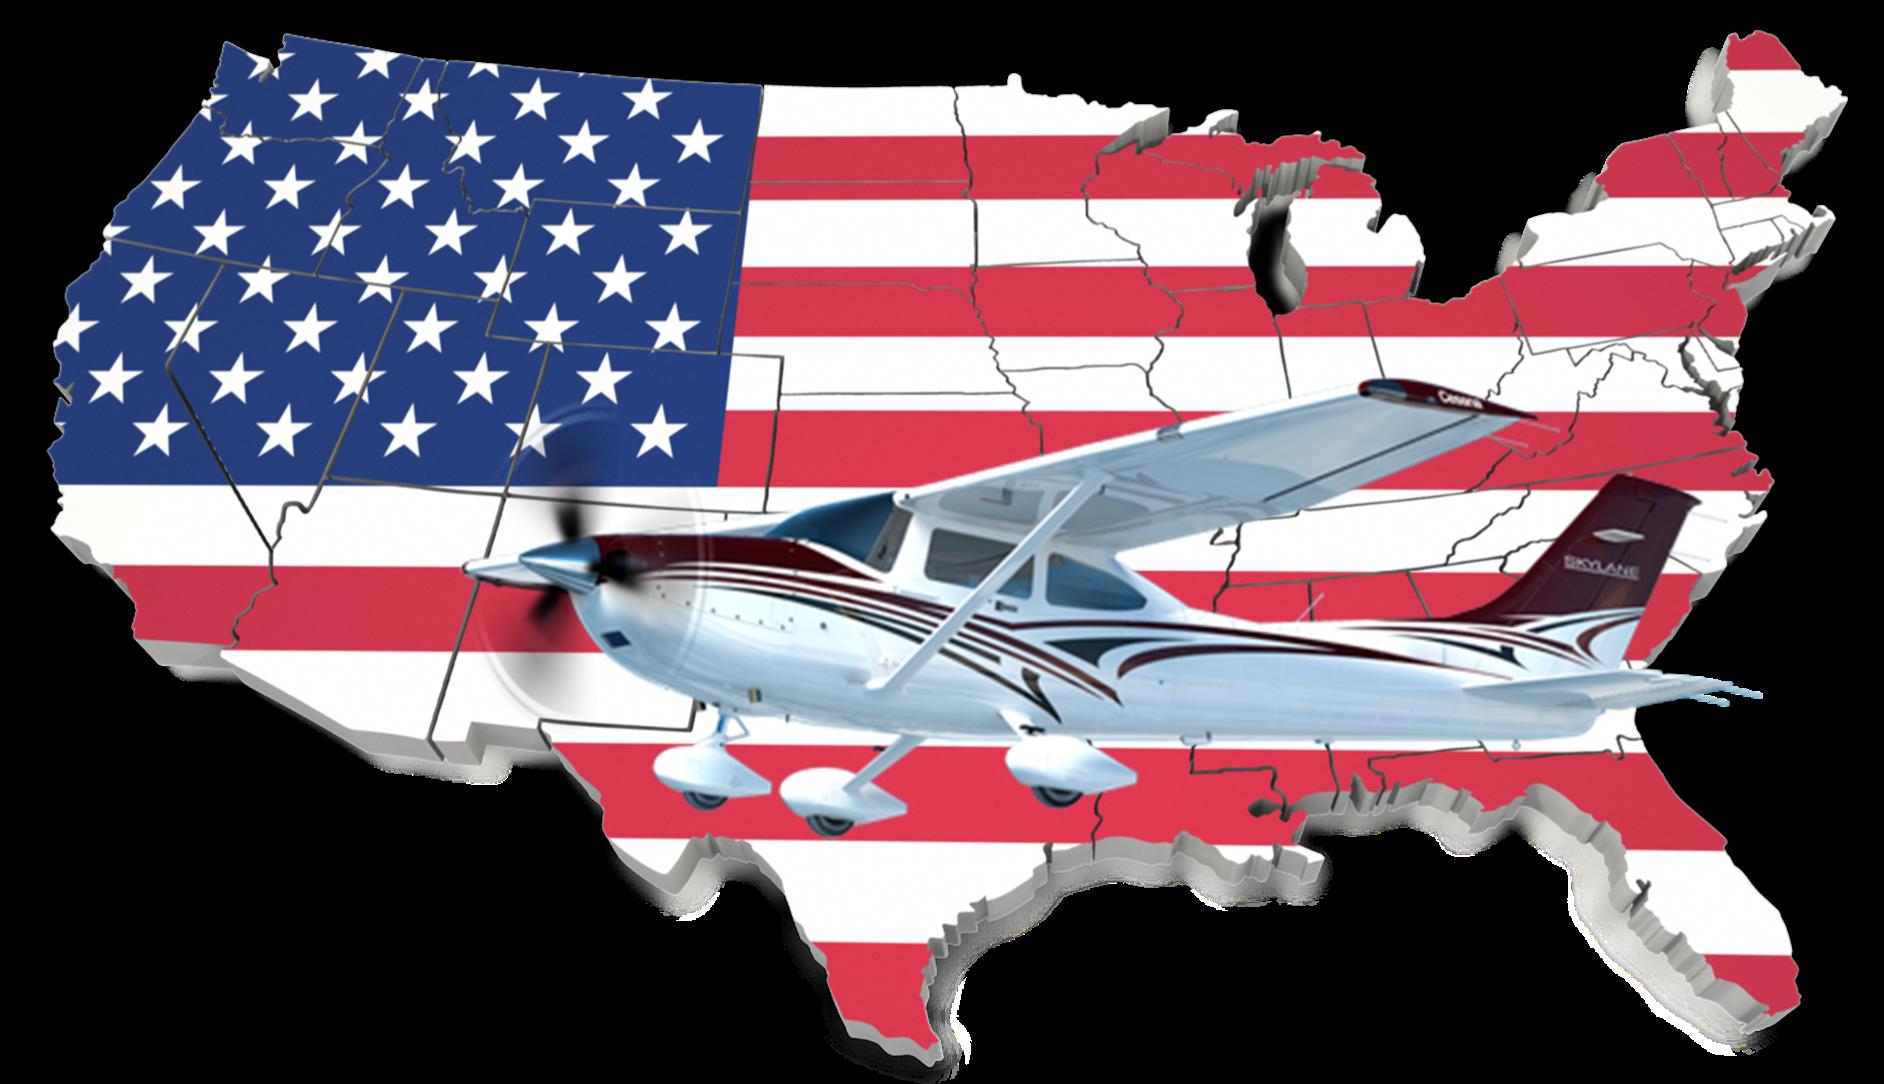 Pilot clipart aeroplane pilot. Aviasia airplane training in